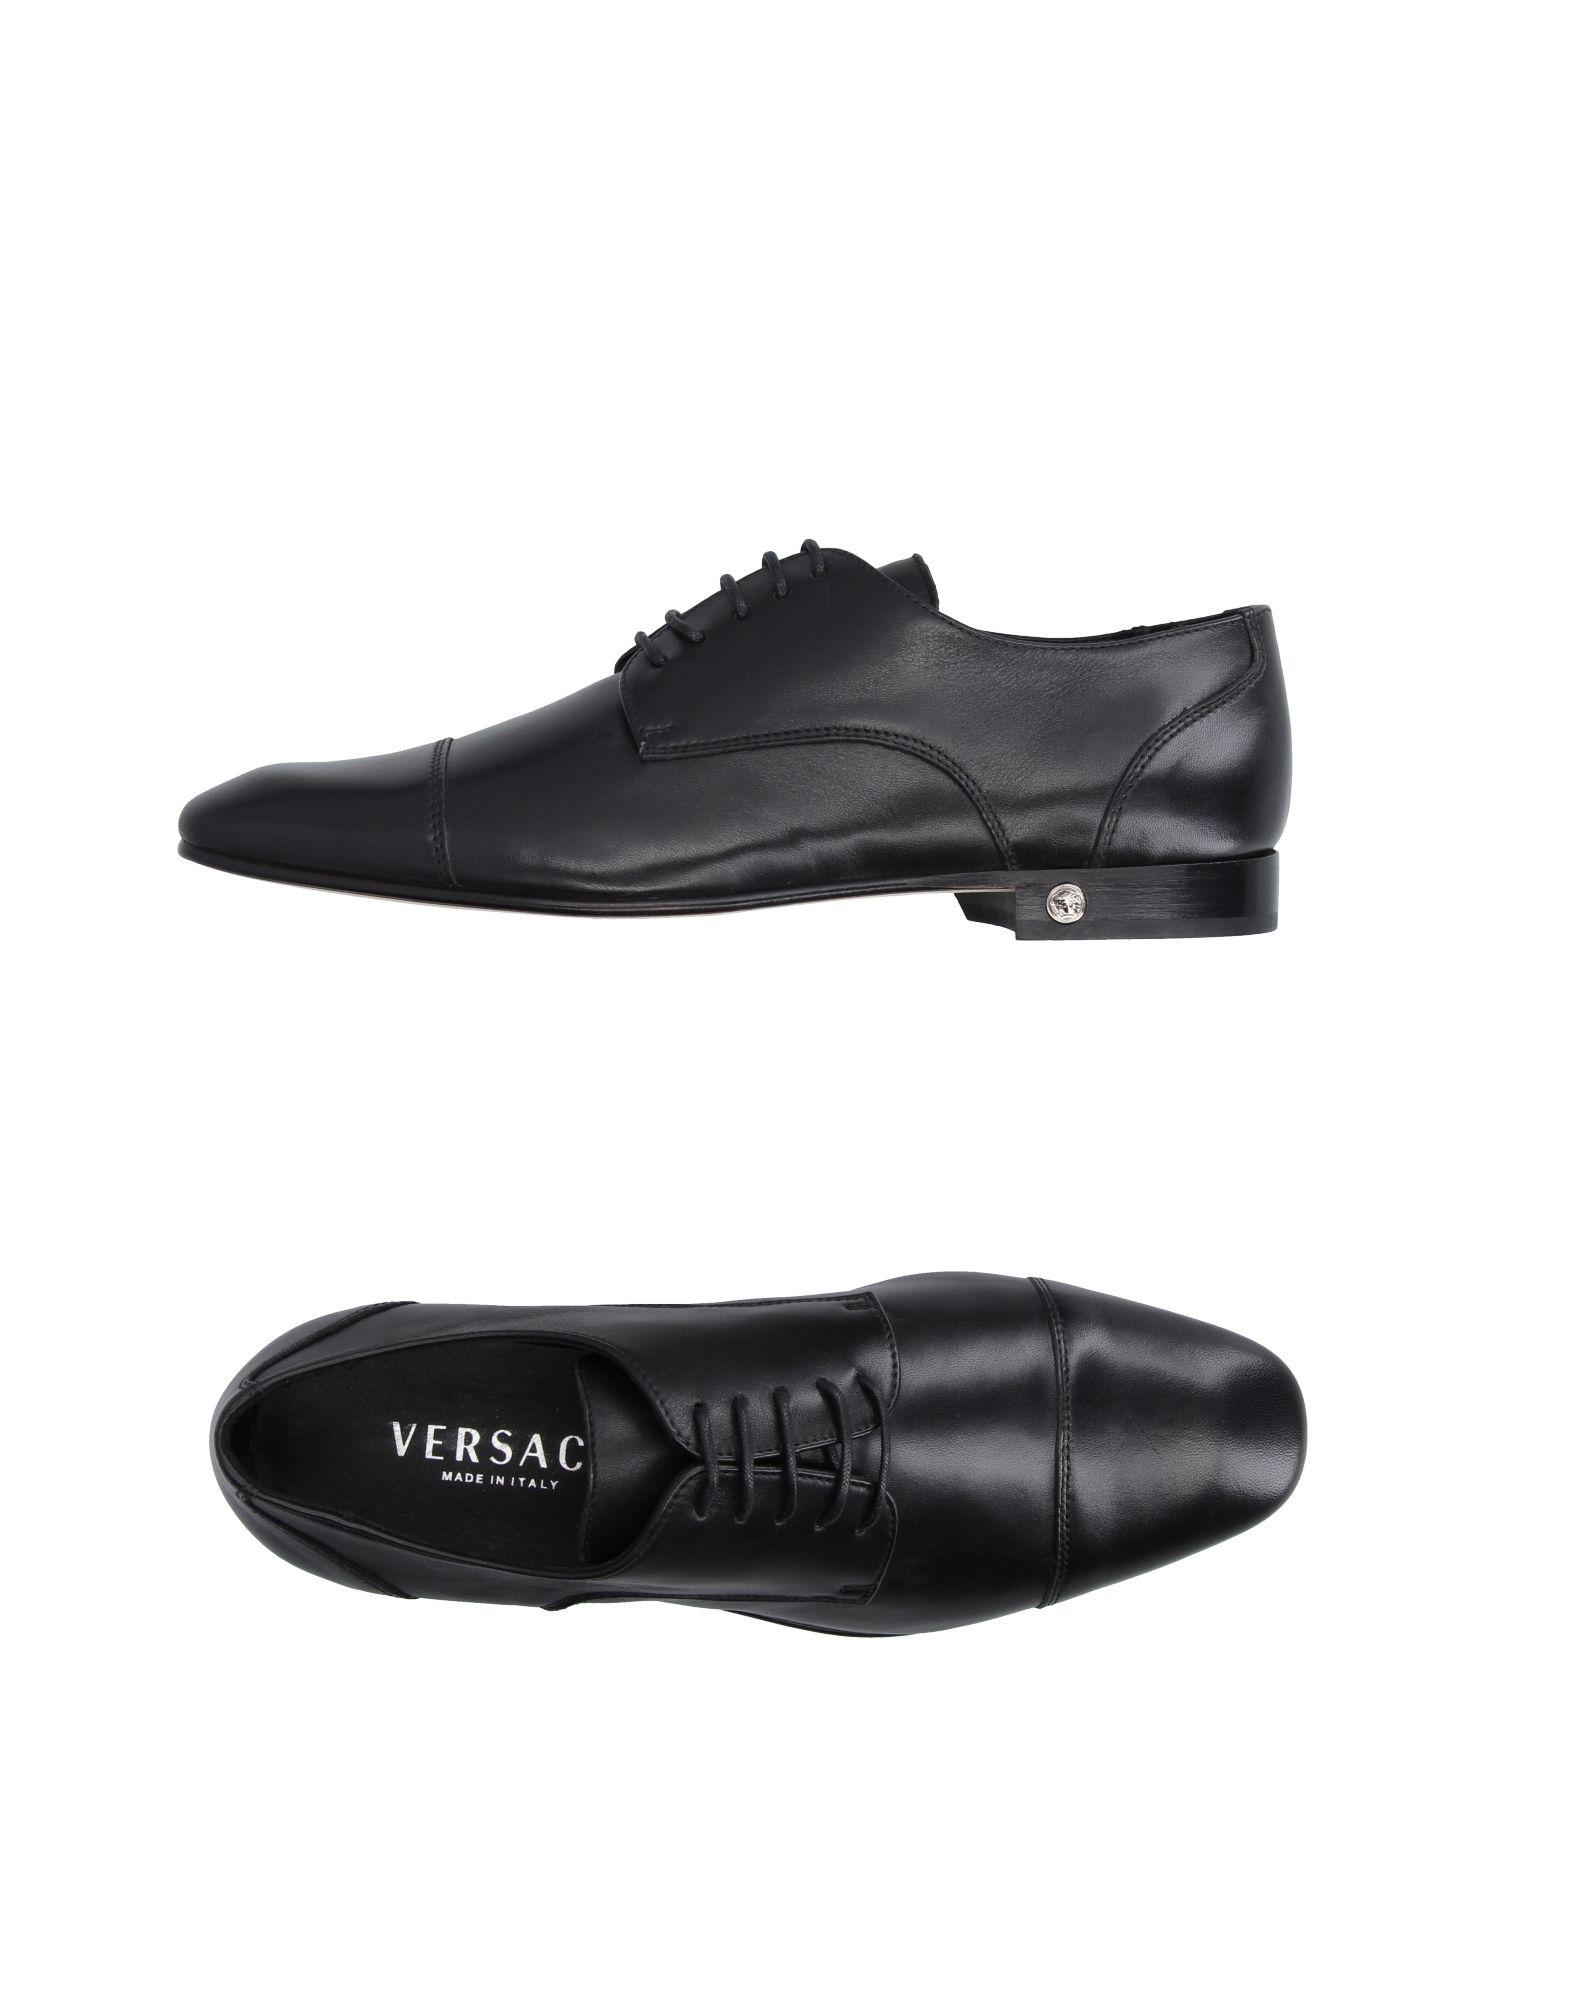 VERSACE Обувь на шнурках первый внутри обувь обувь обувь обувь обувь обувь обувь обувь обувь 8a2549 мужская армия green 40 метров